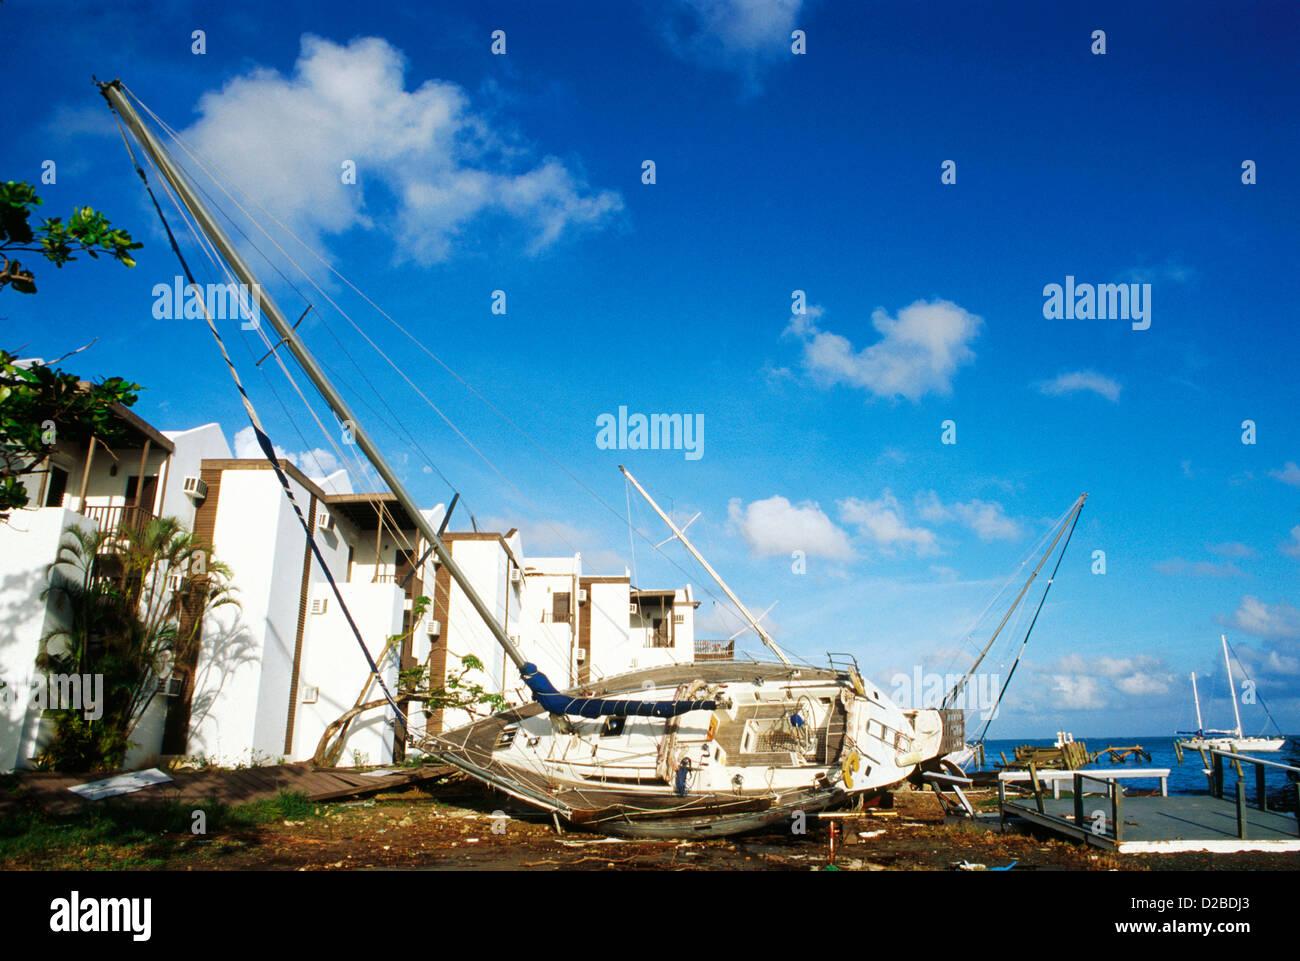 St. Croix, Us Virgin Islands. Schäden durch Hurrikan Marilyn. Stockbild